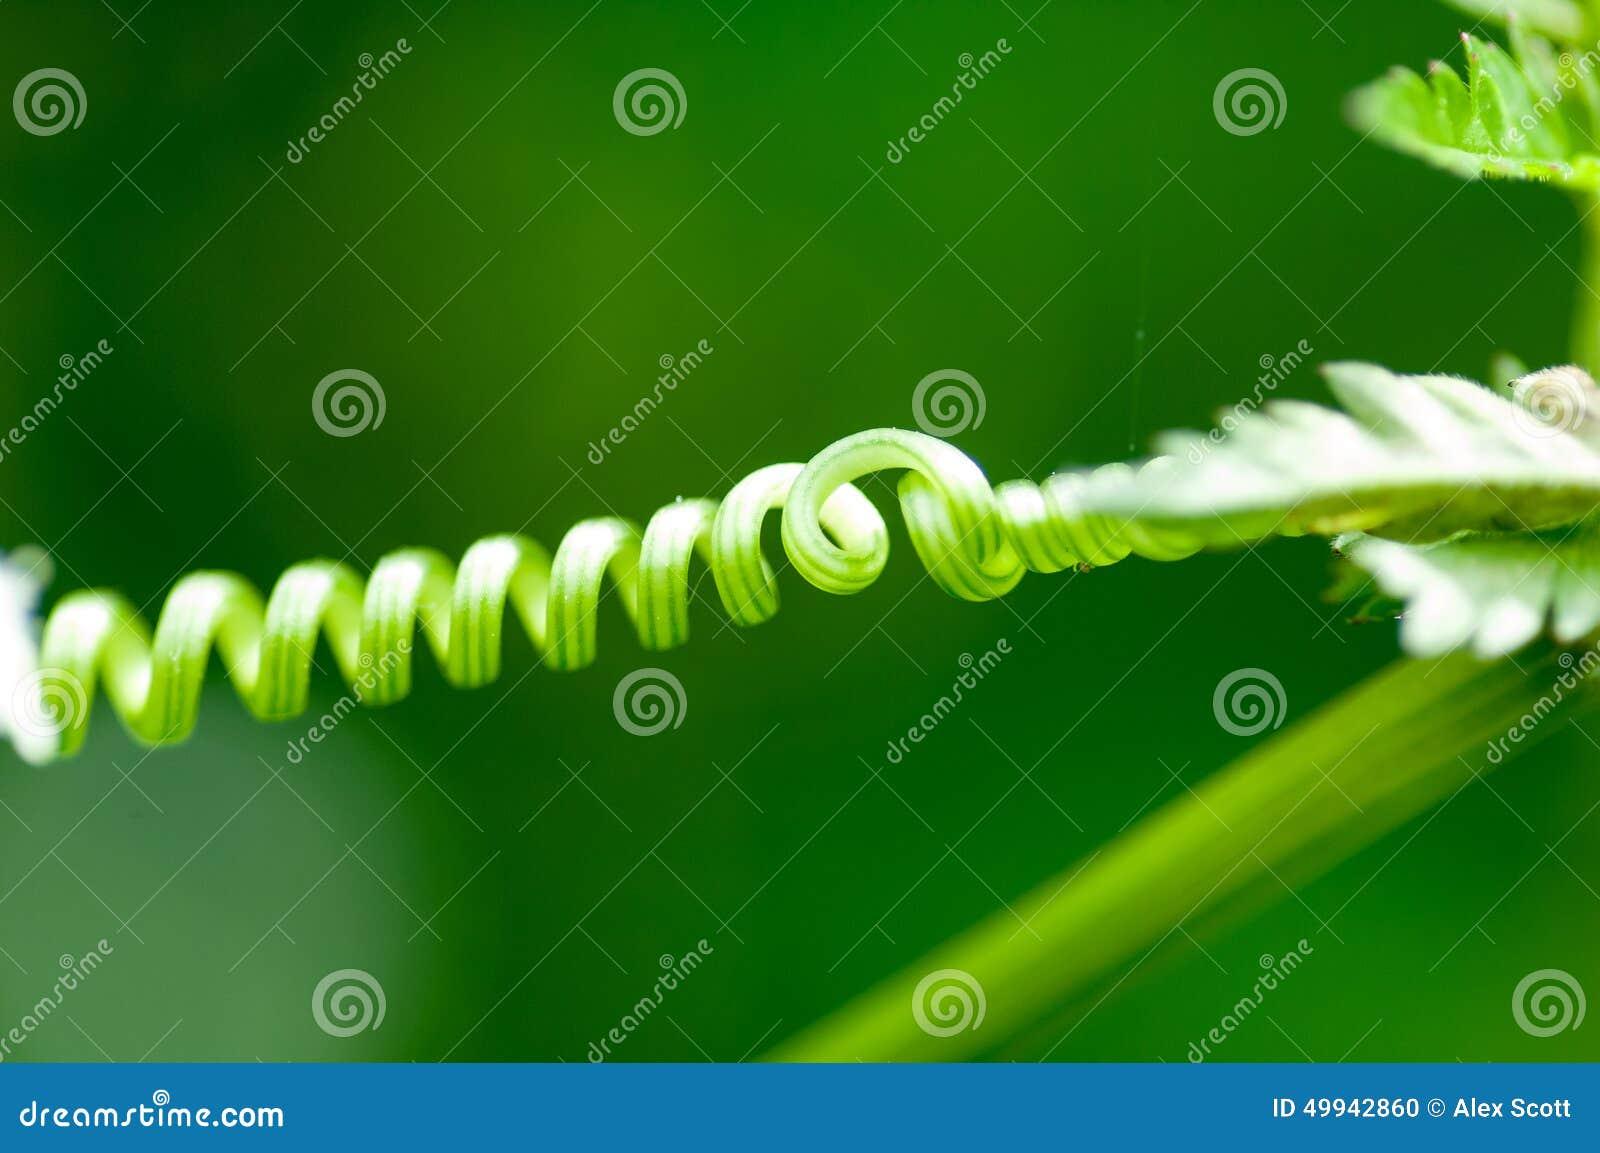 Zarcillo de la arveja del detalle de la planta